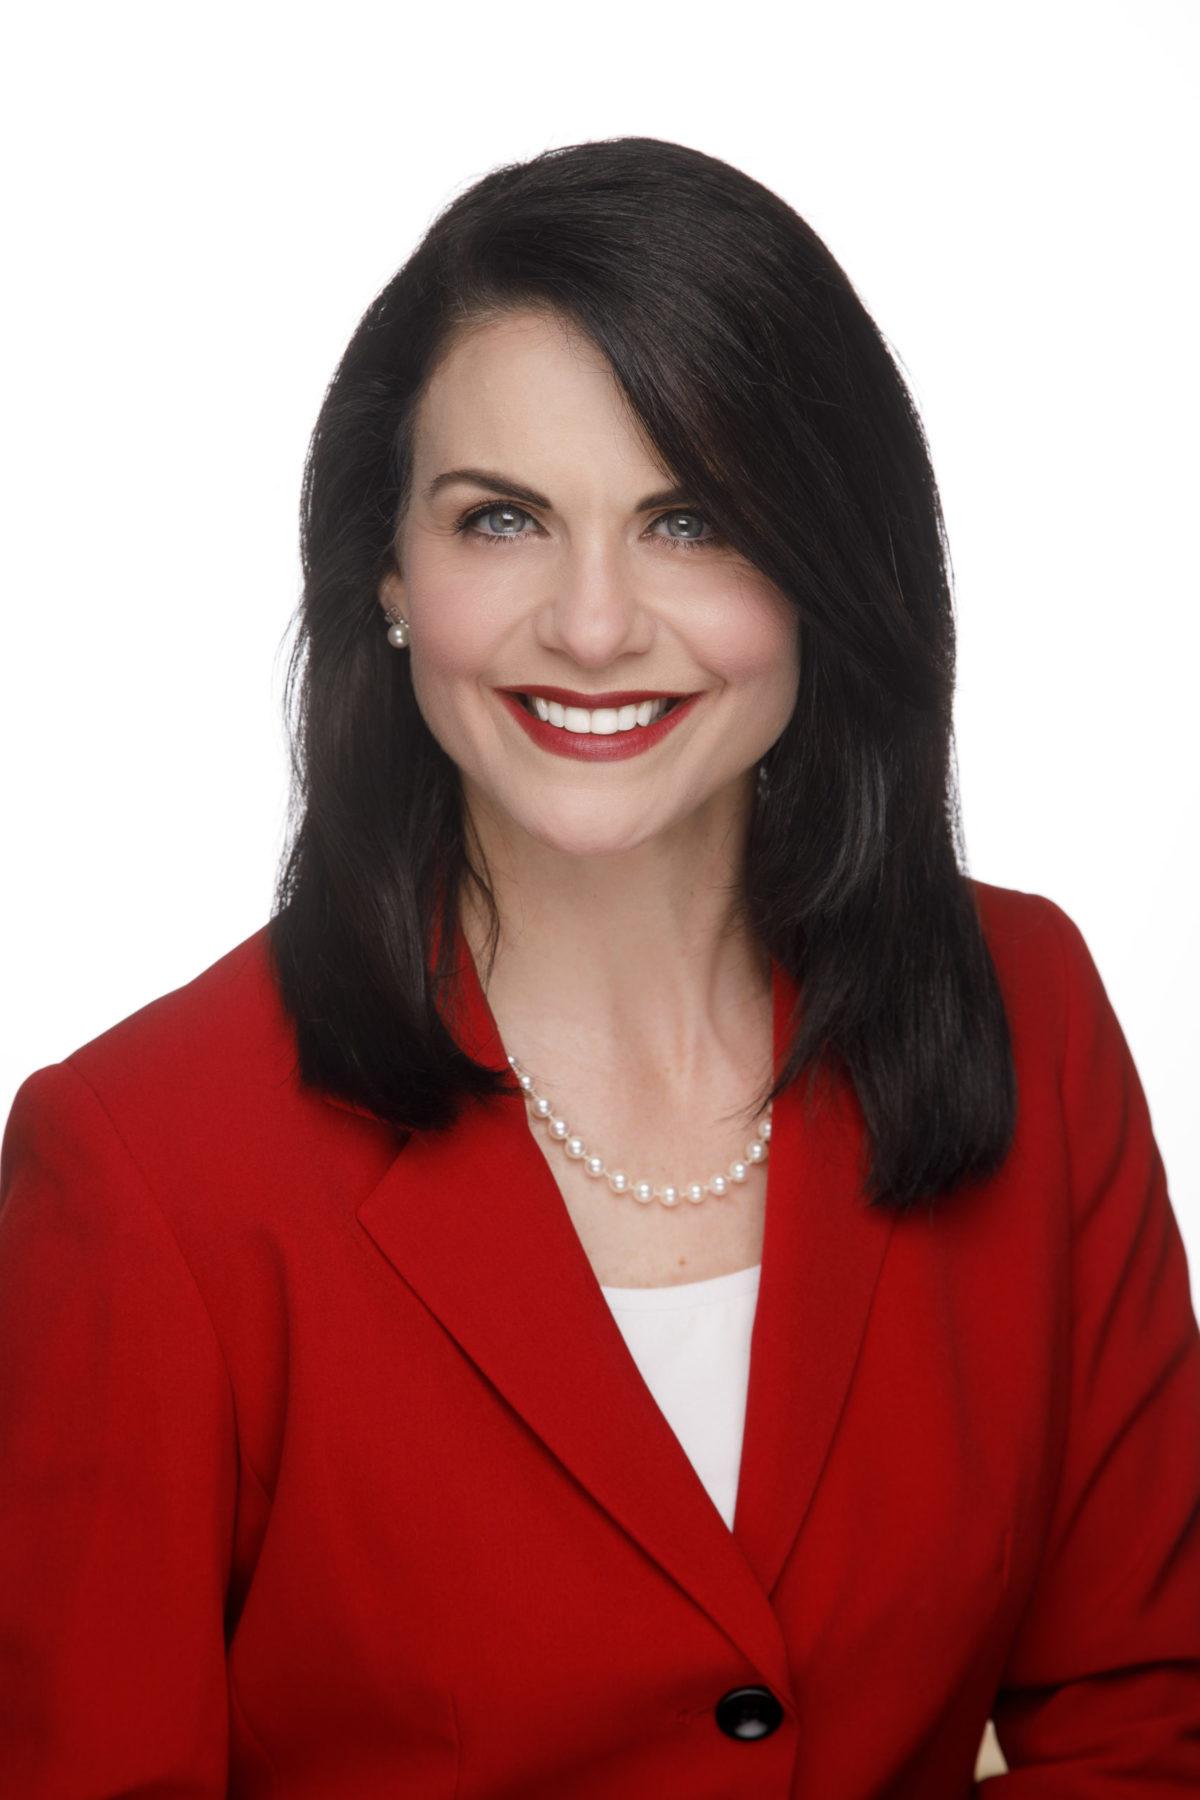 Branning Announces Major Lee County Endorsements